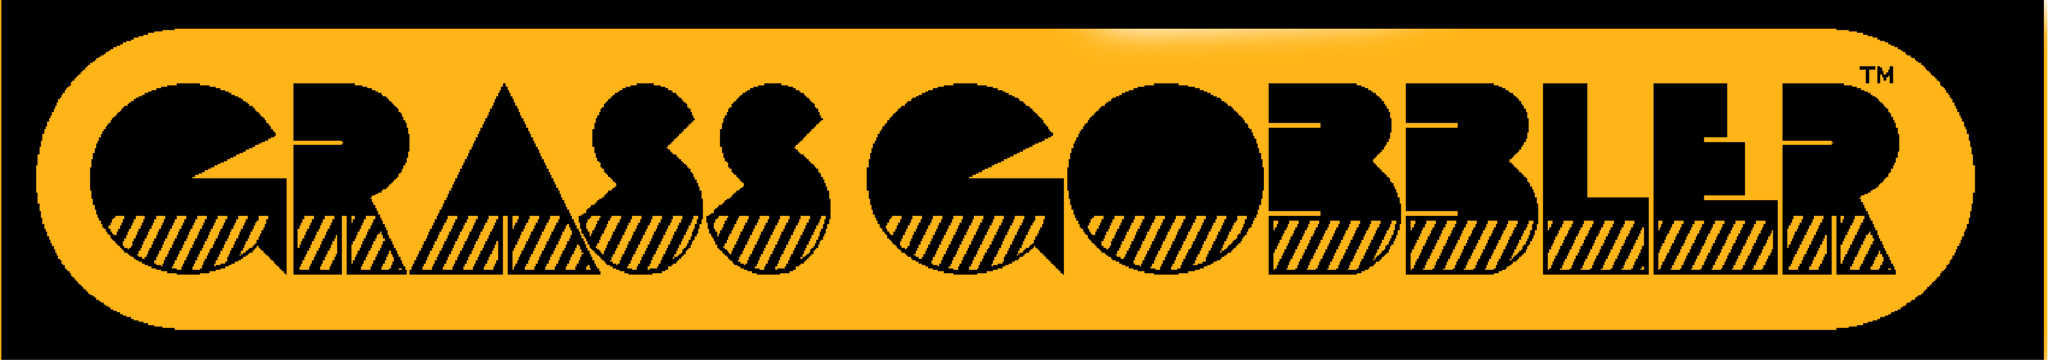 GRASS_GOBBLER Hi res